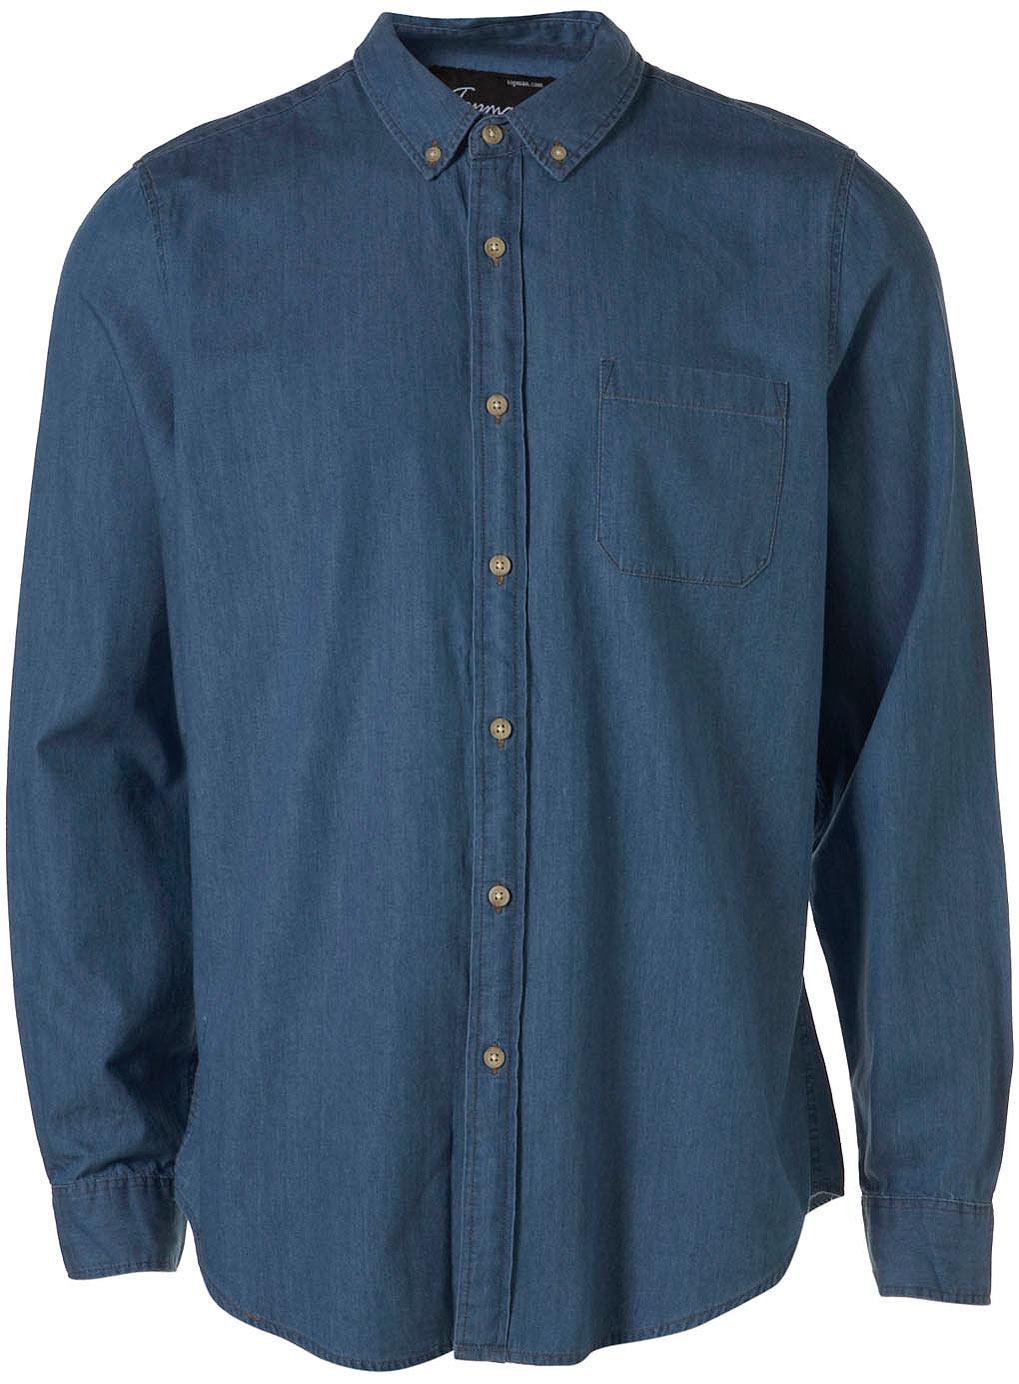 Long Denim Button Down Collar Shirt In Blue For Men Denim